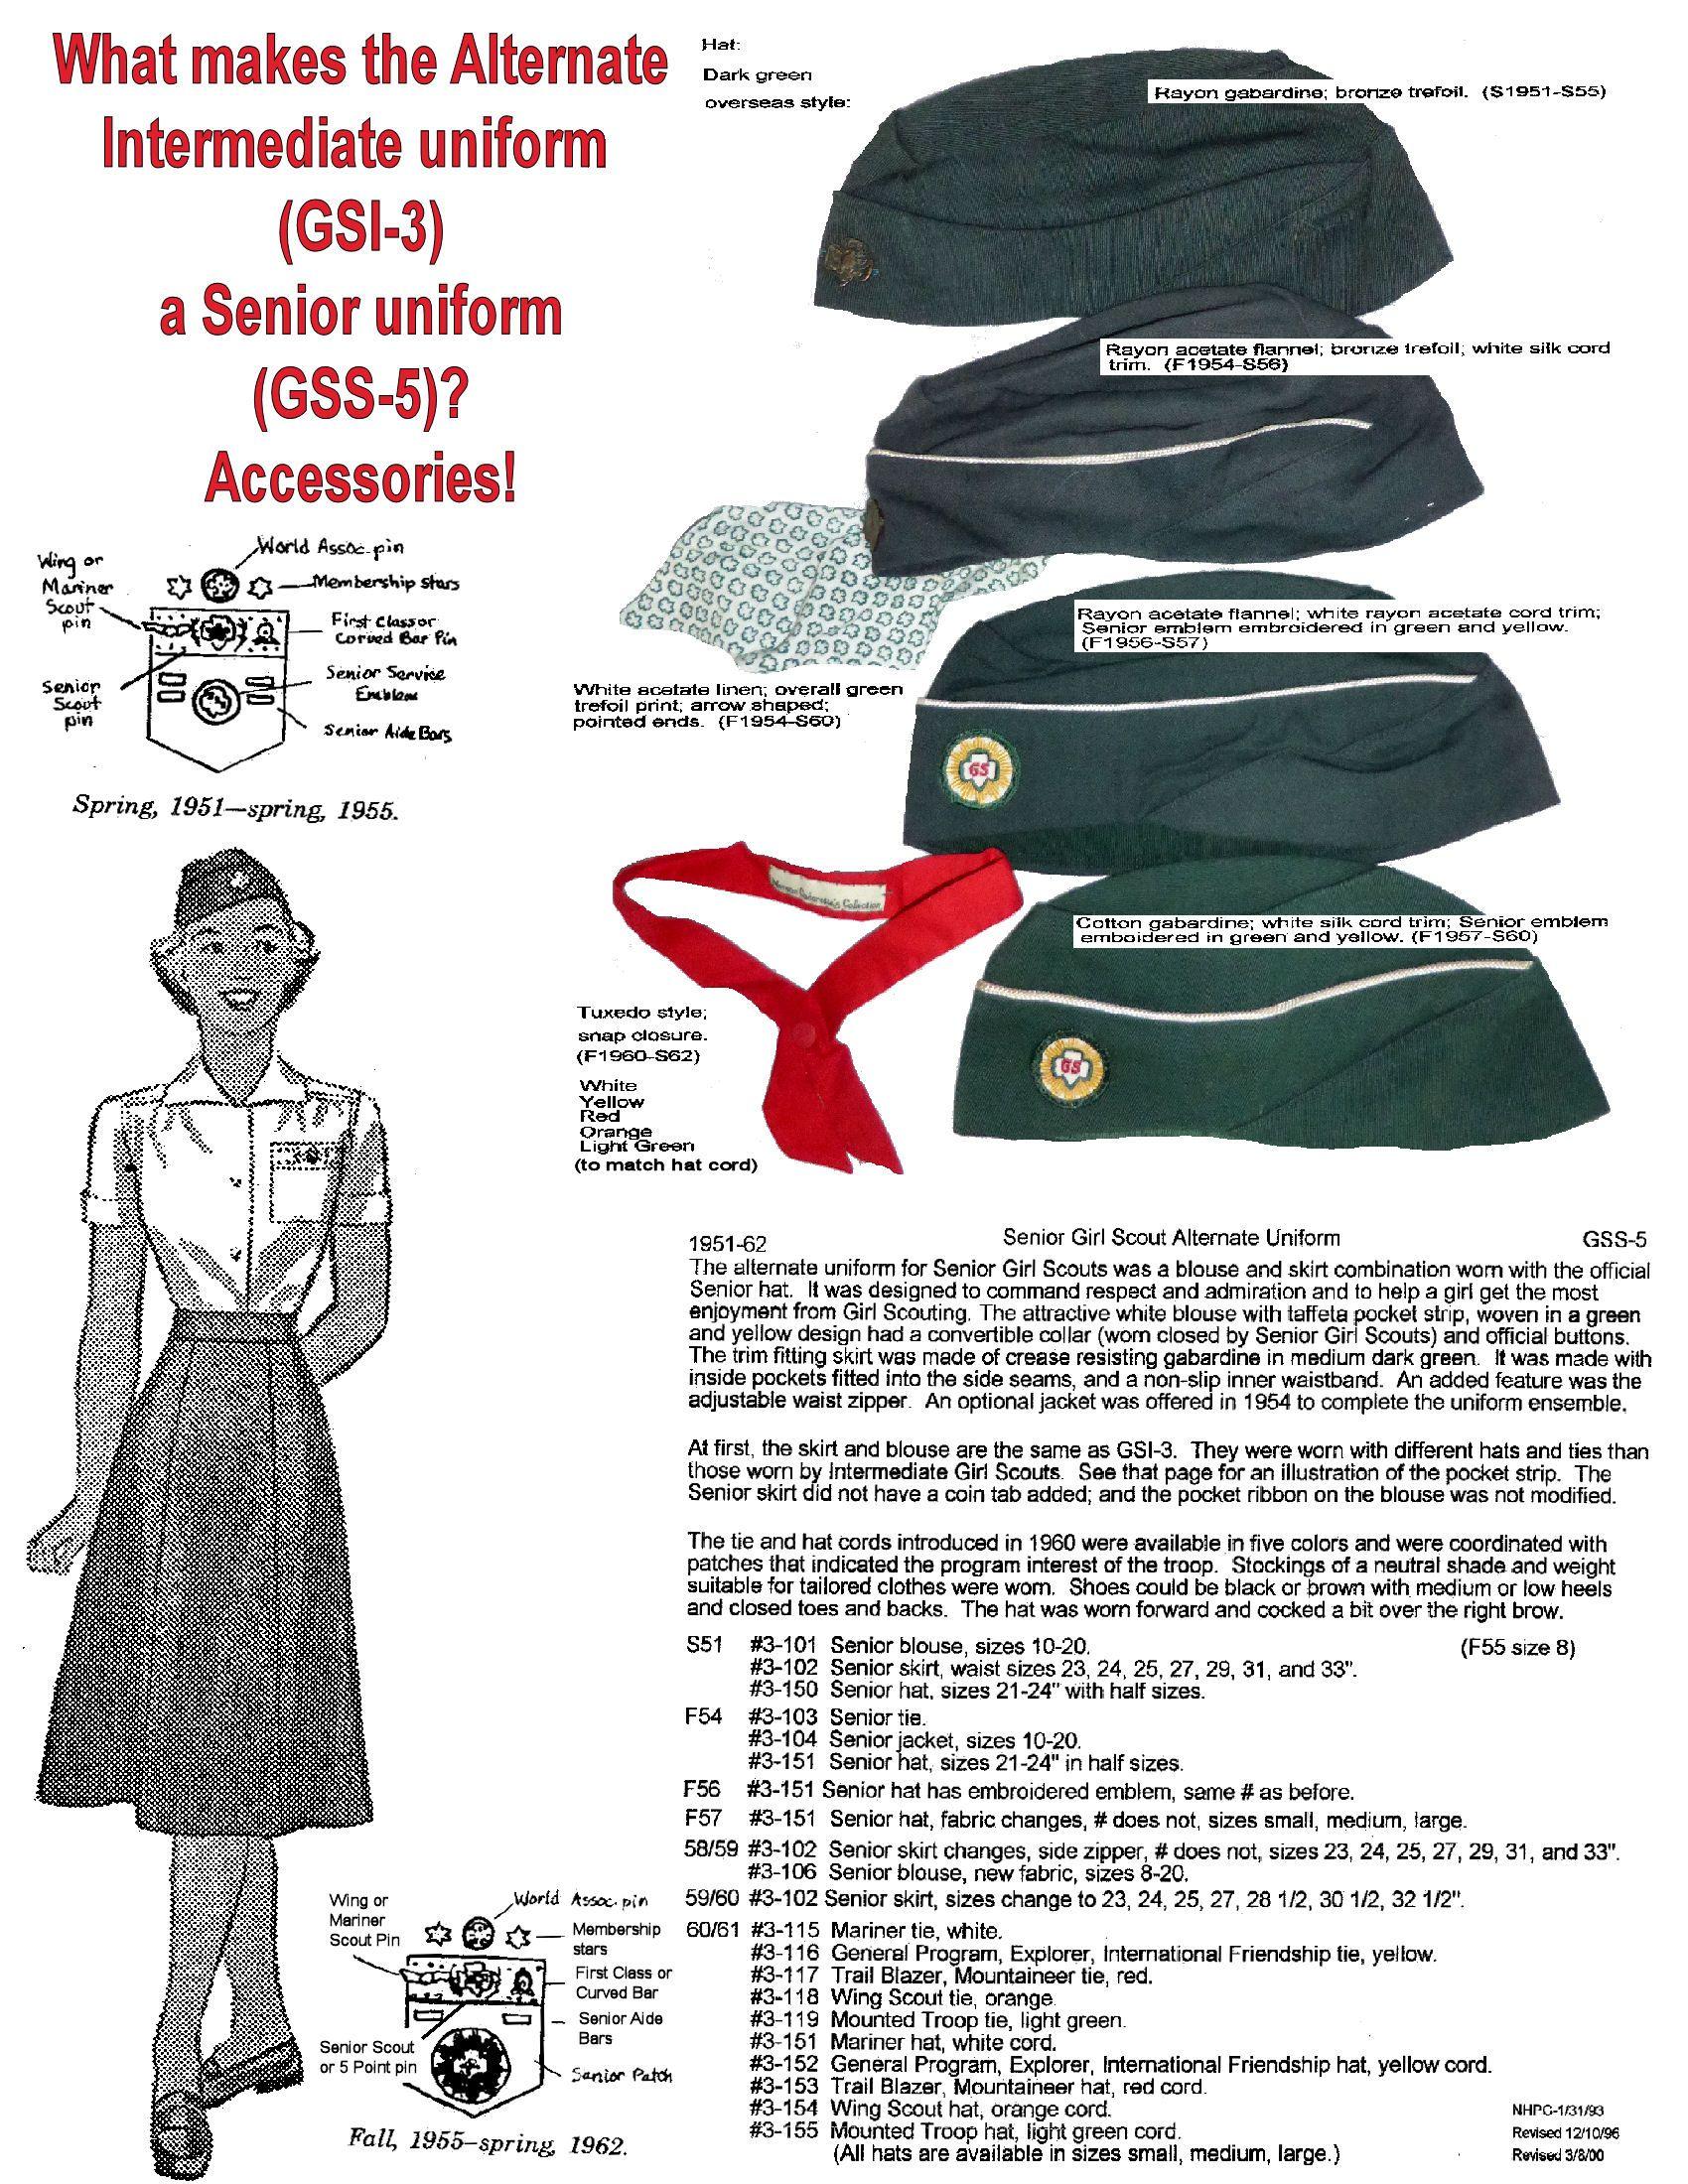 Vintage girl guide uniforms